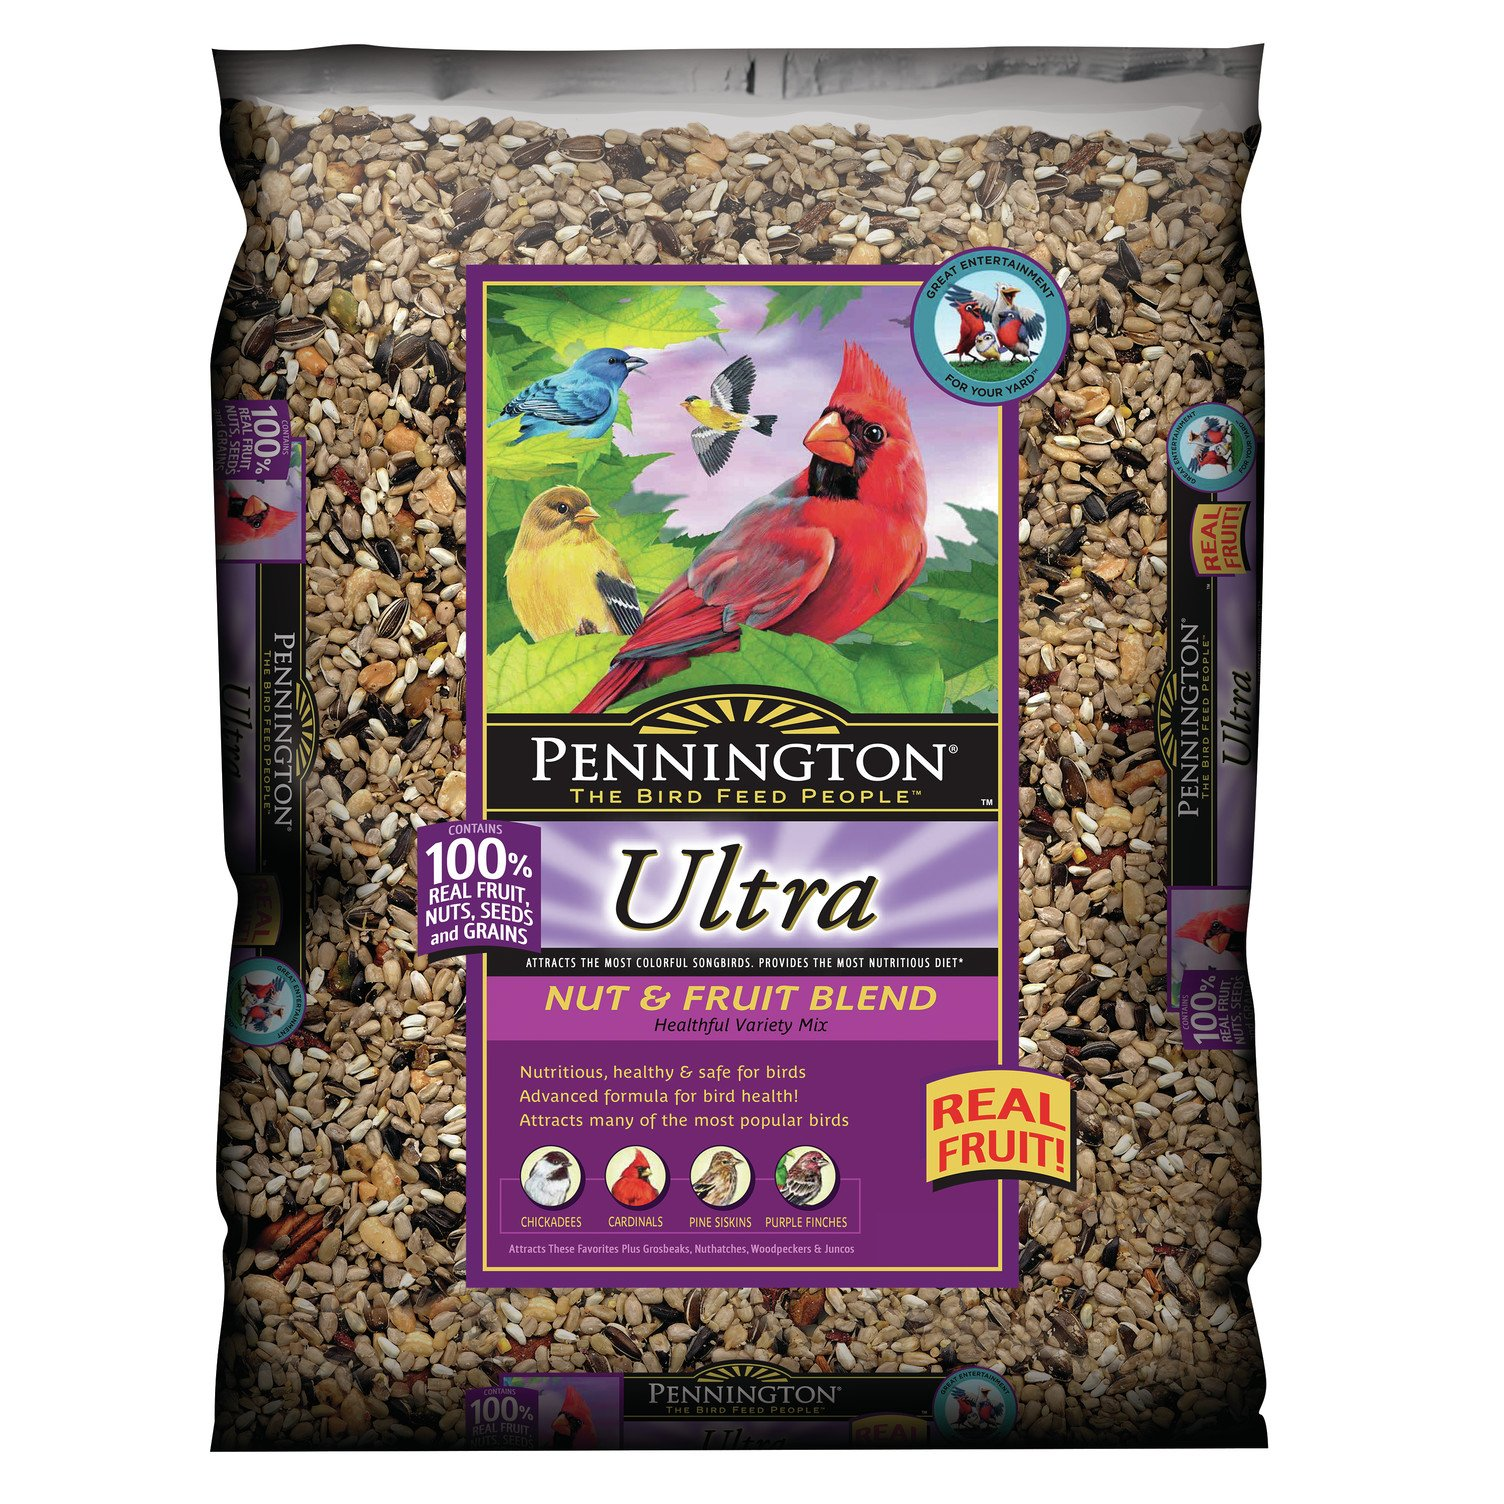 Pennington Ultra Fruit & Nut Blend Wild Bird Seed and Feed, 12 lbs by Pennington